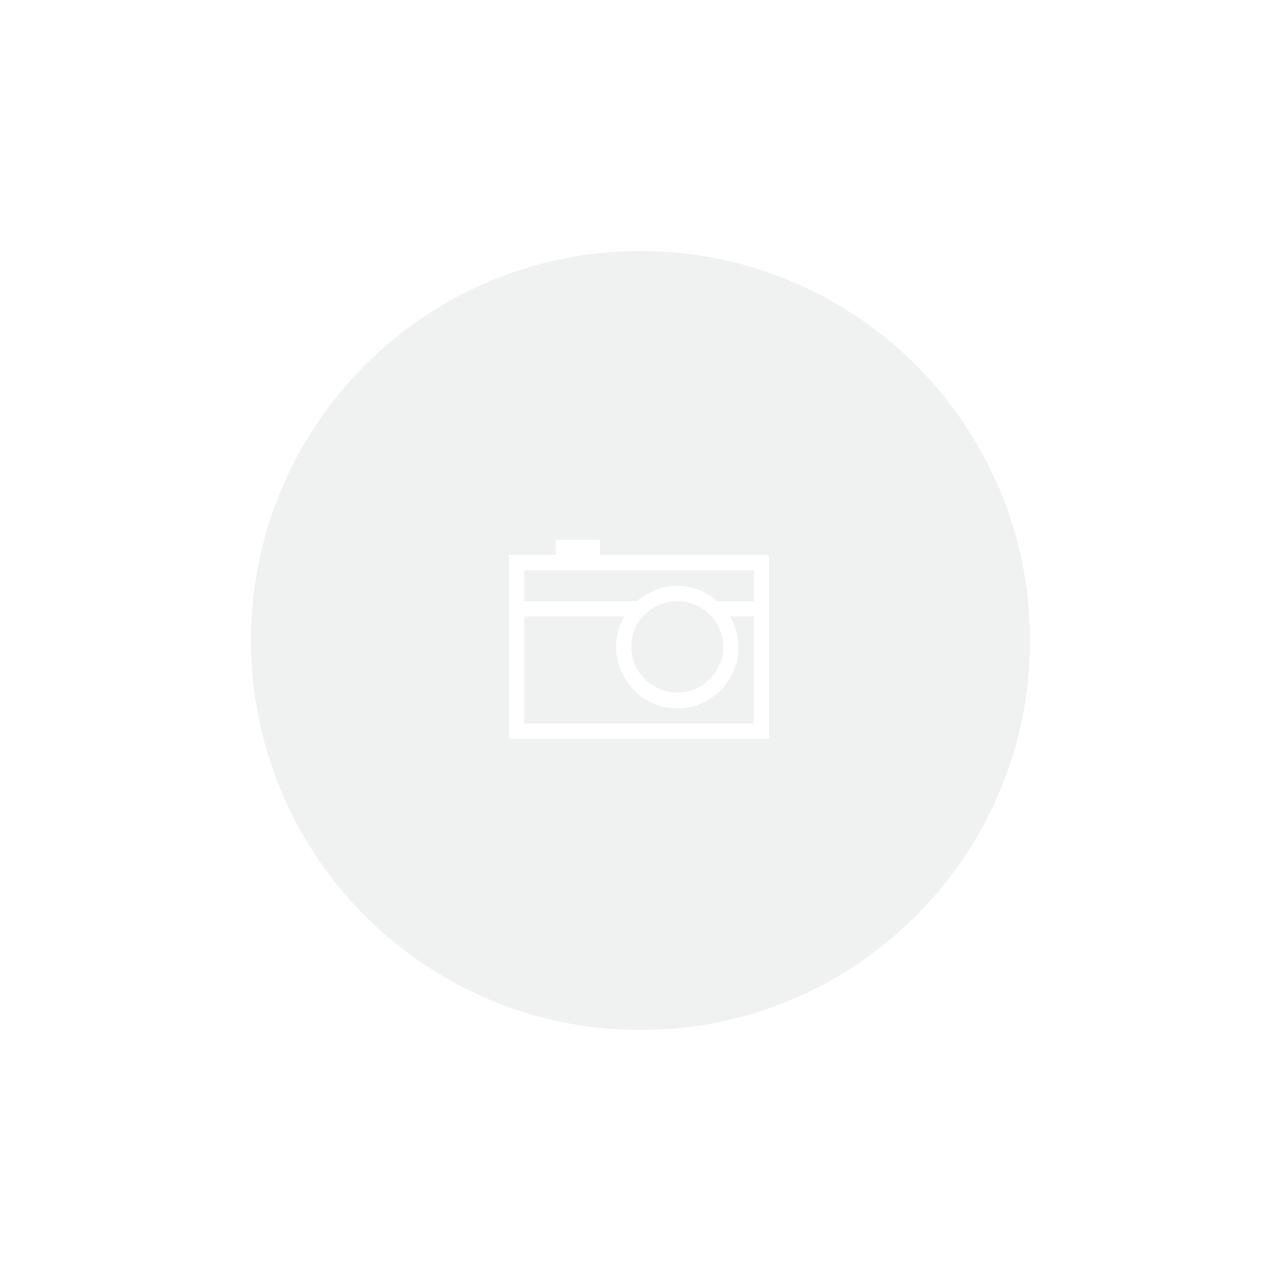 Blusa Onça Cardada 115IF17 Est 003